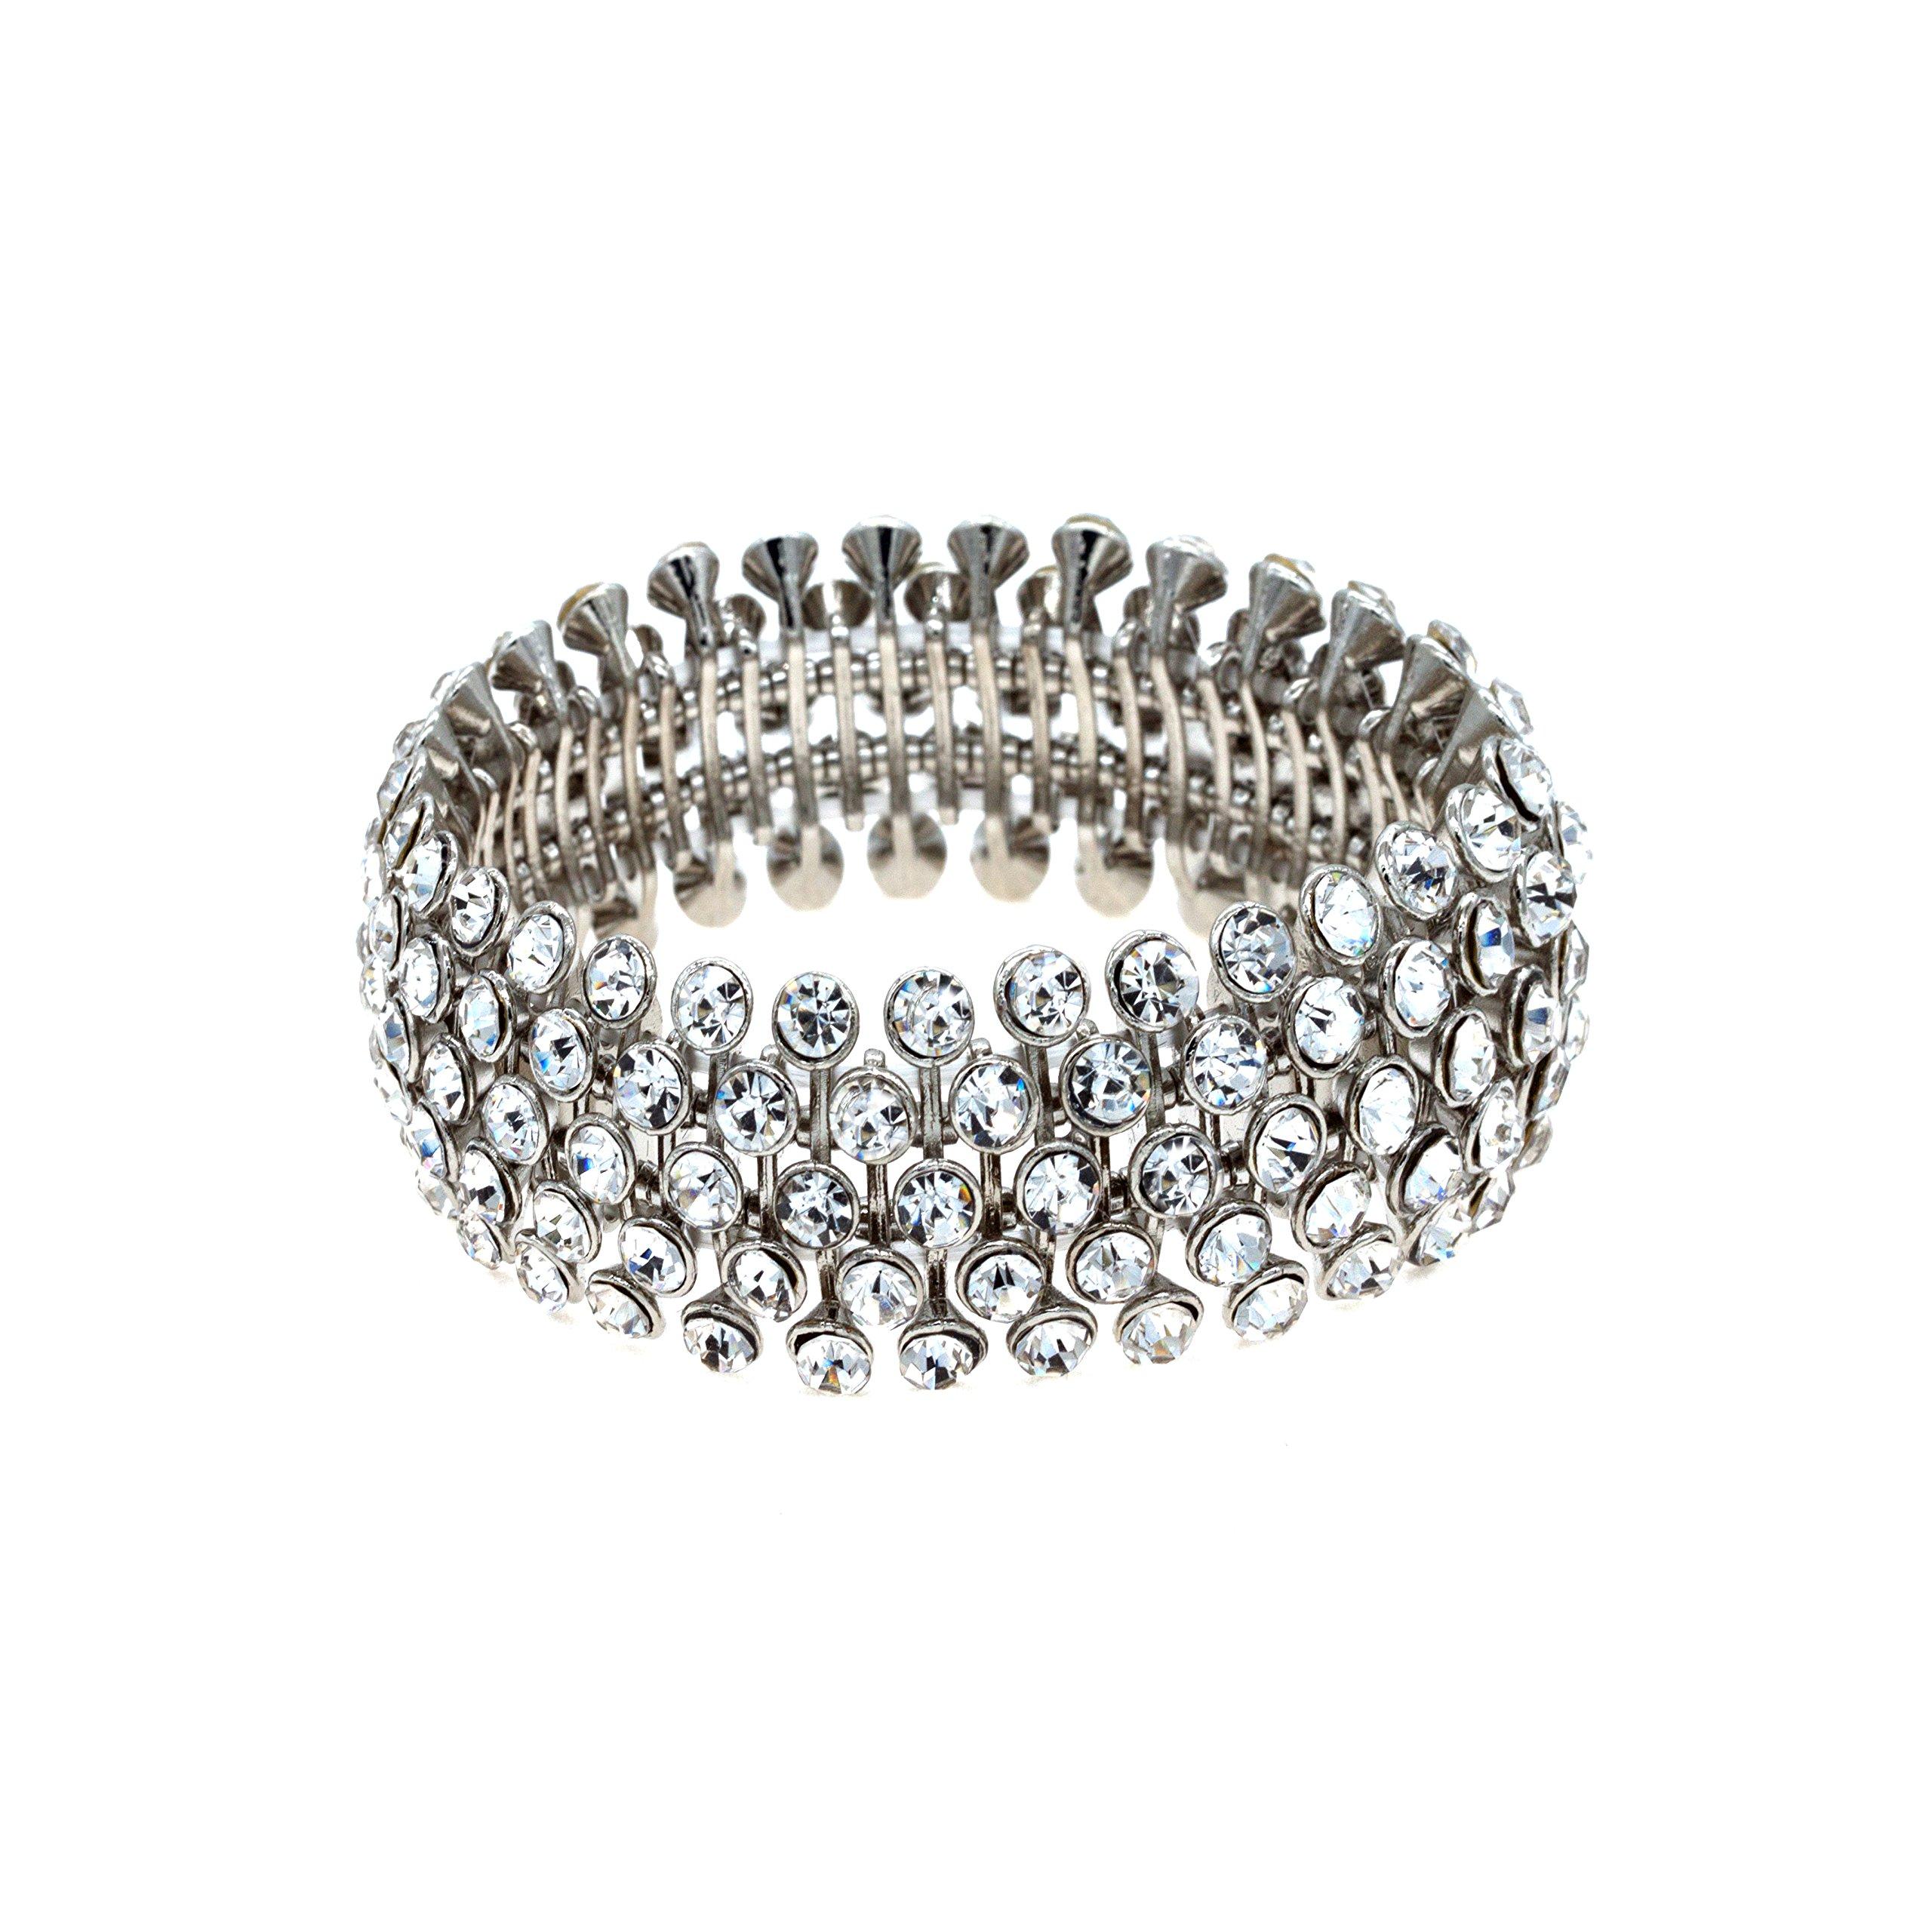 Lavencious Tennis 5 Row Rhinestone Stretch Bracelets Bridal Evening Party Jewelry For Woman Bangle (Silver)